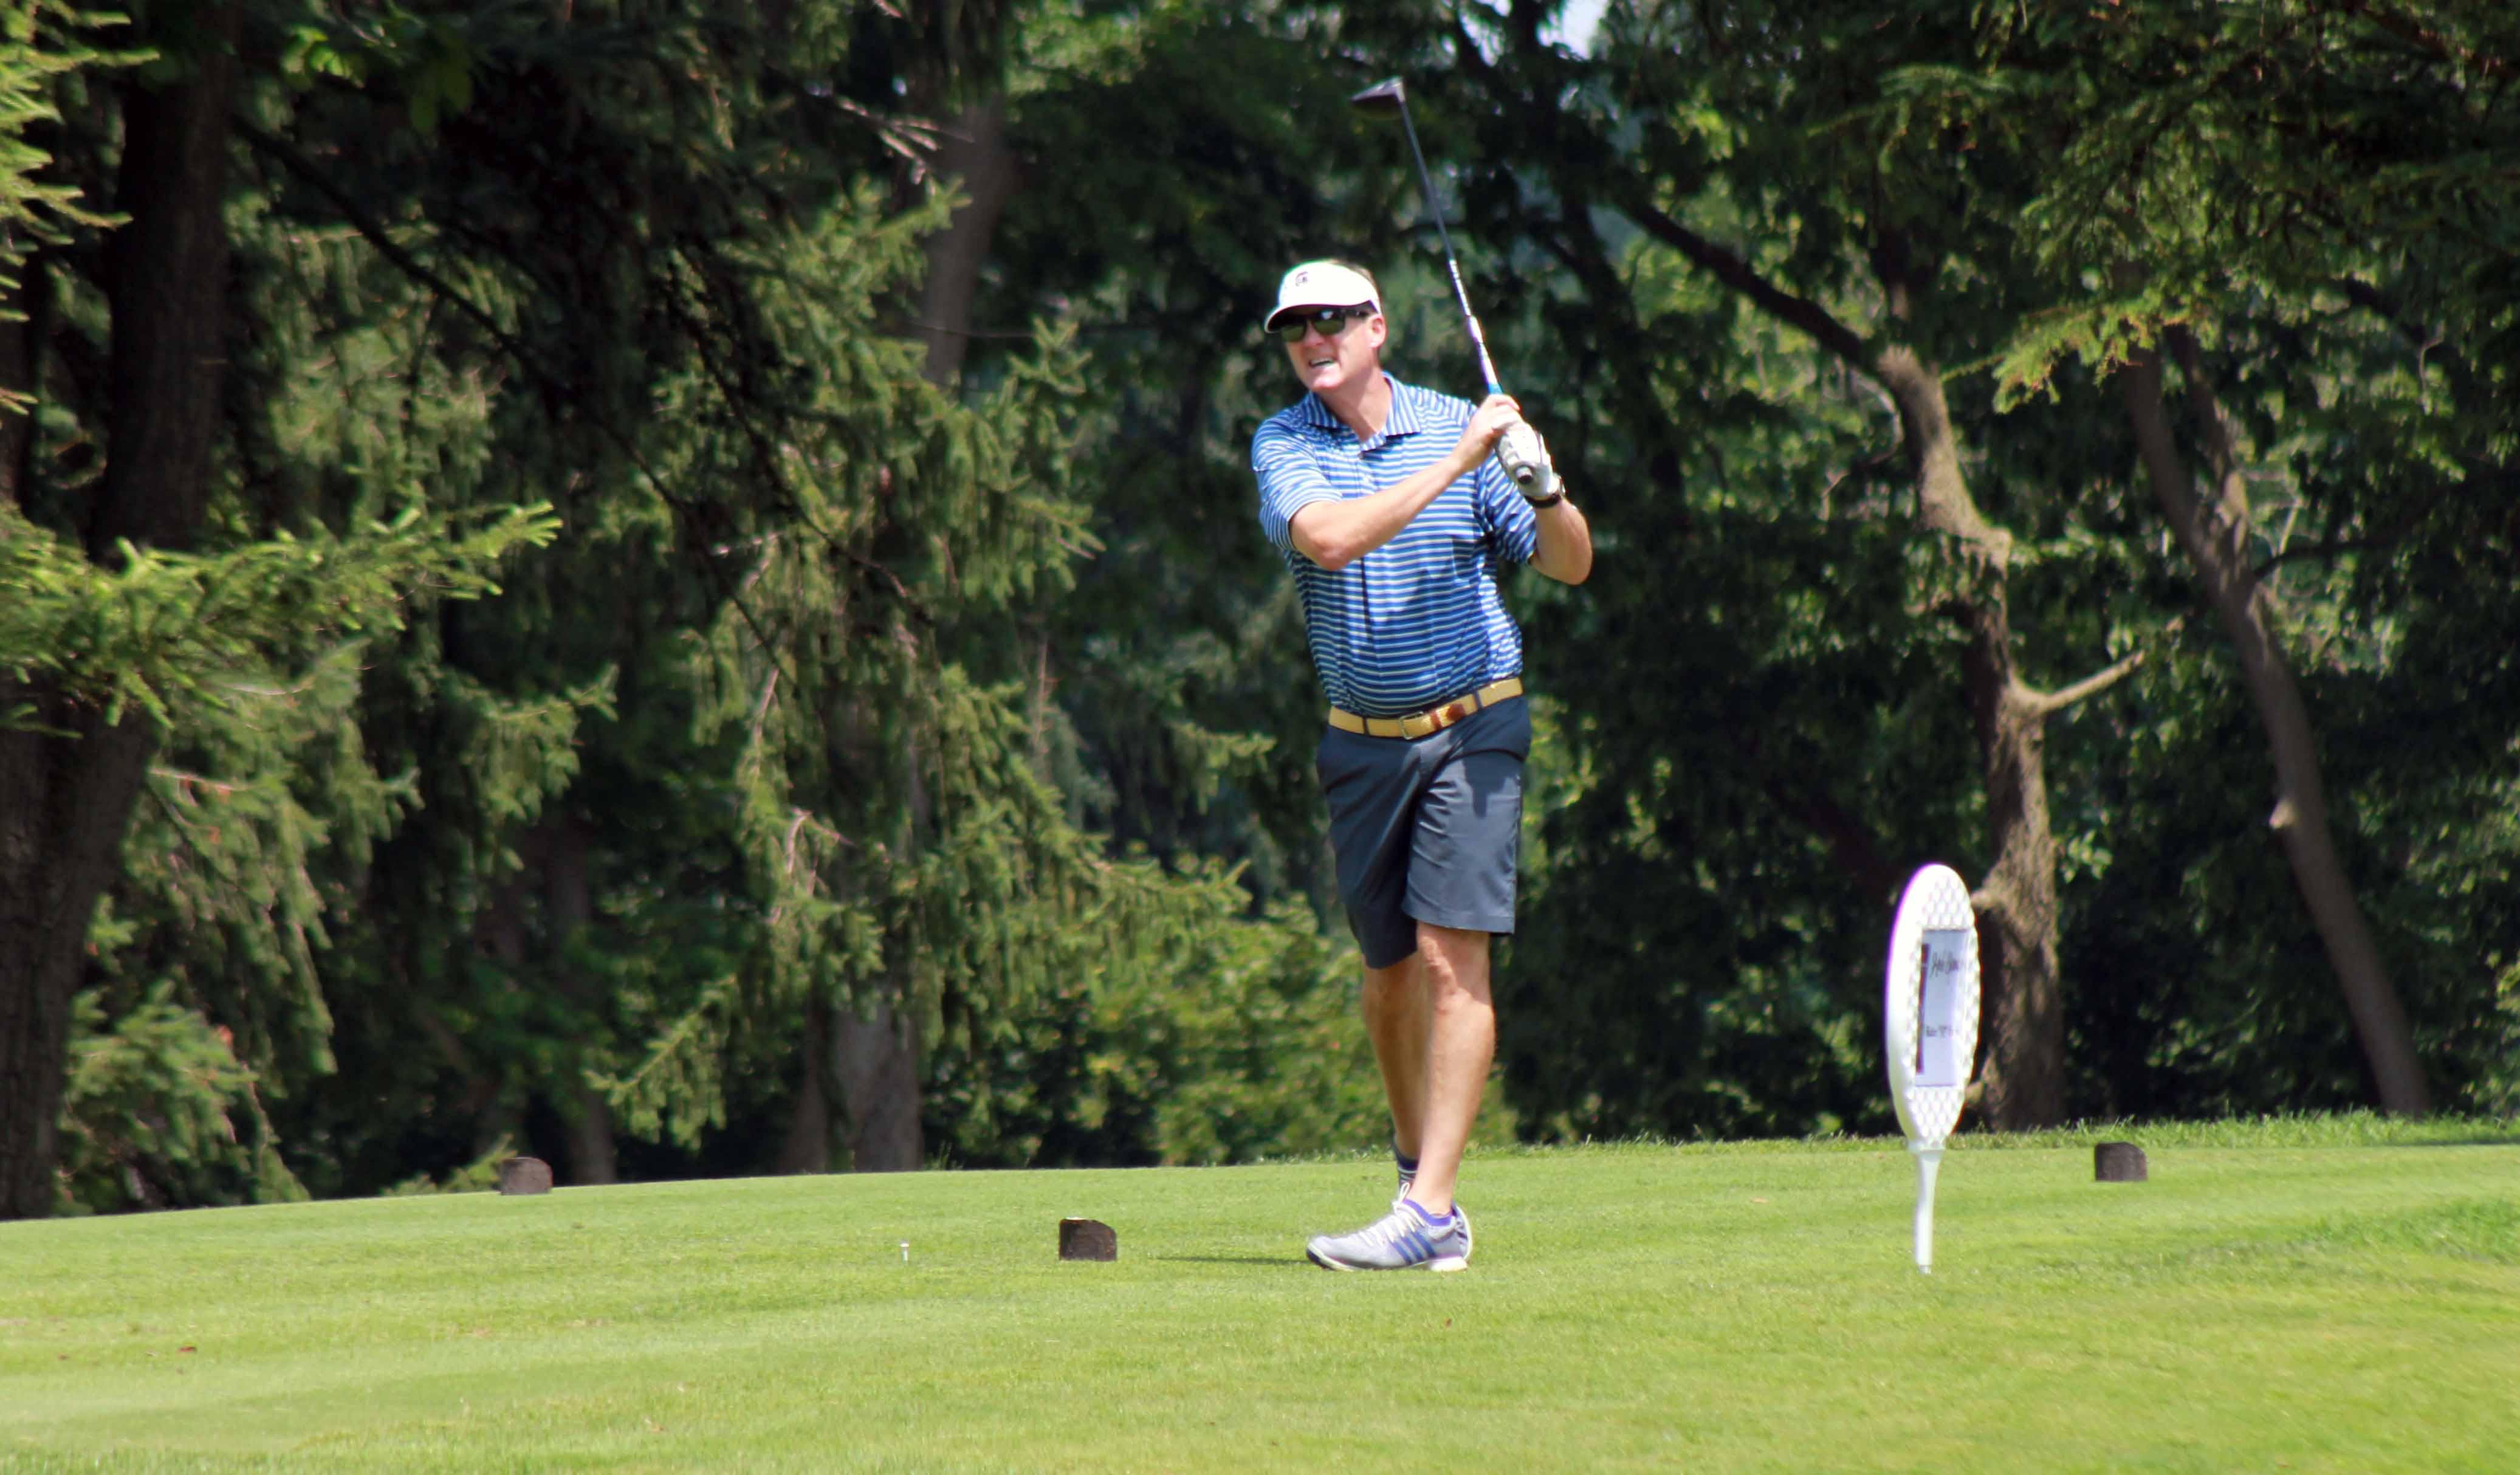 PNA Foundation Golf Outing 2018